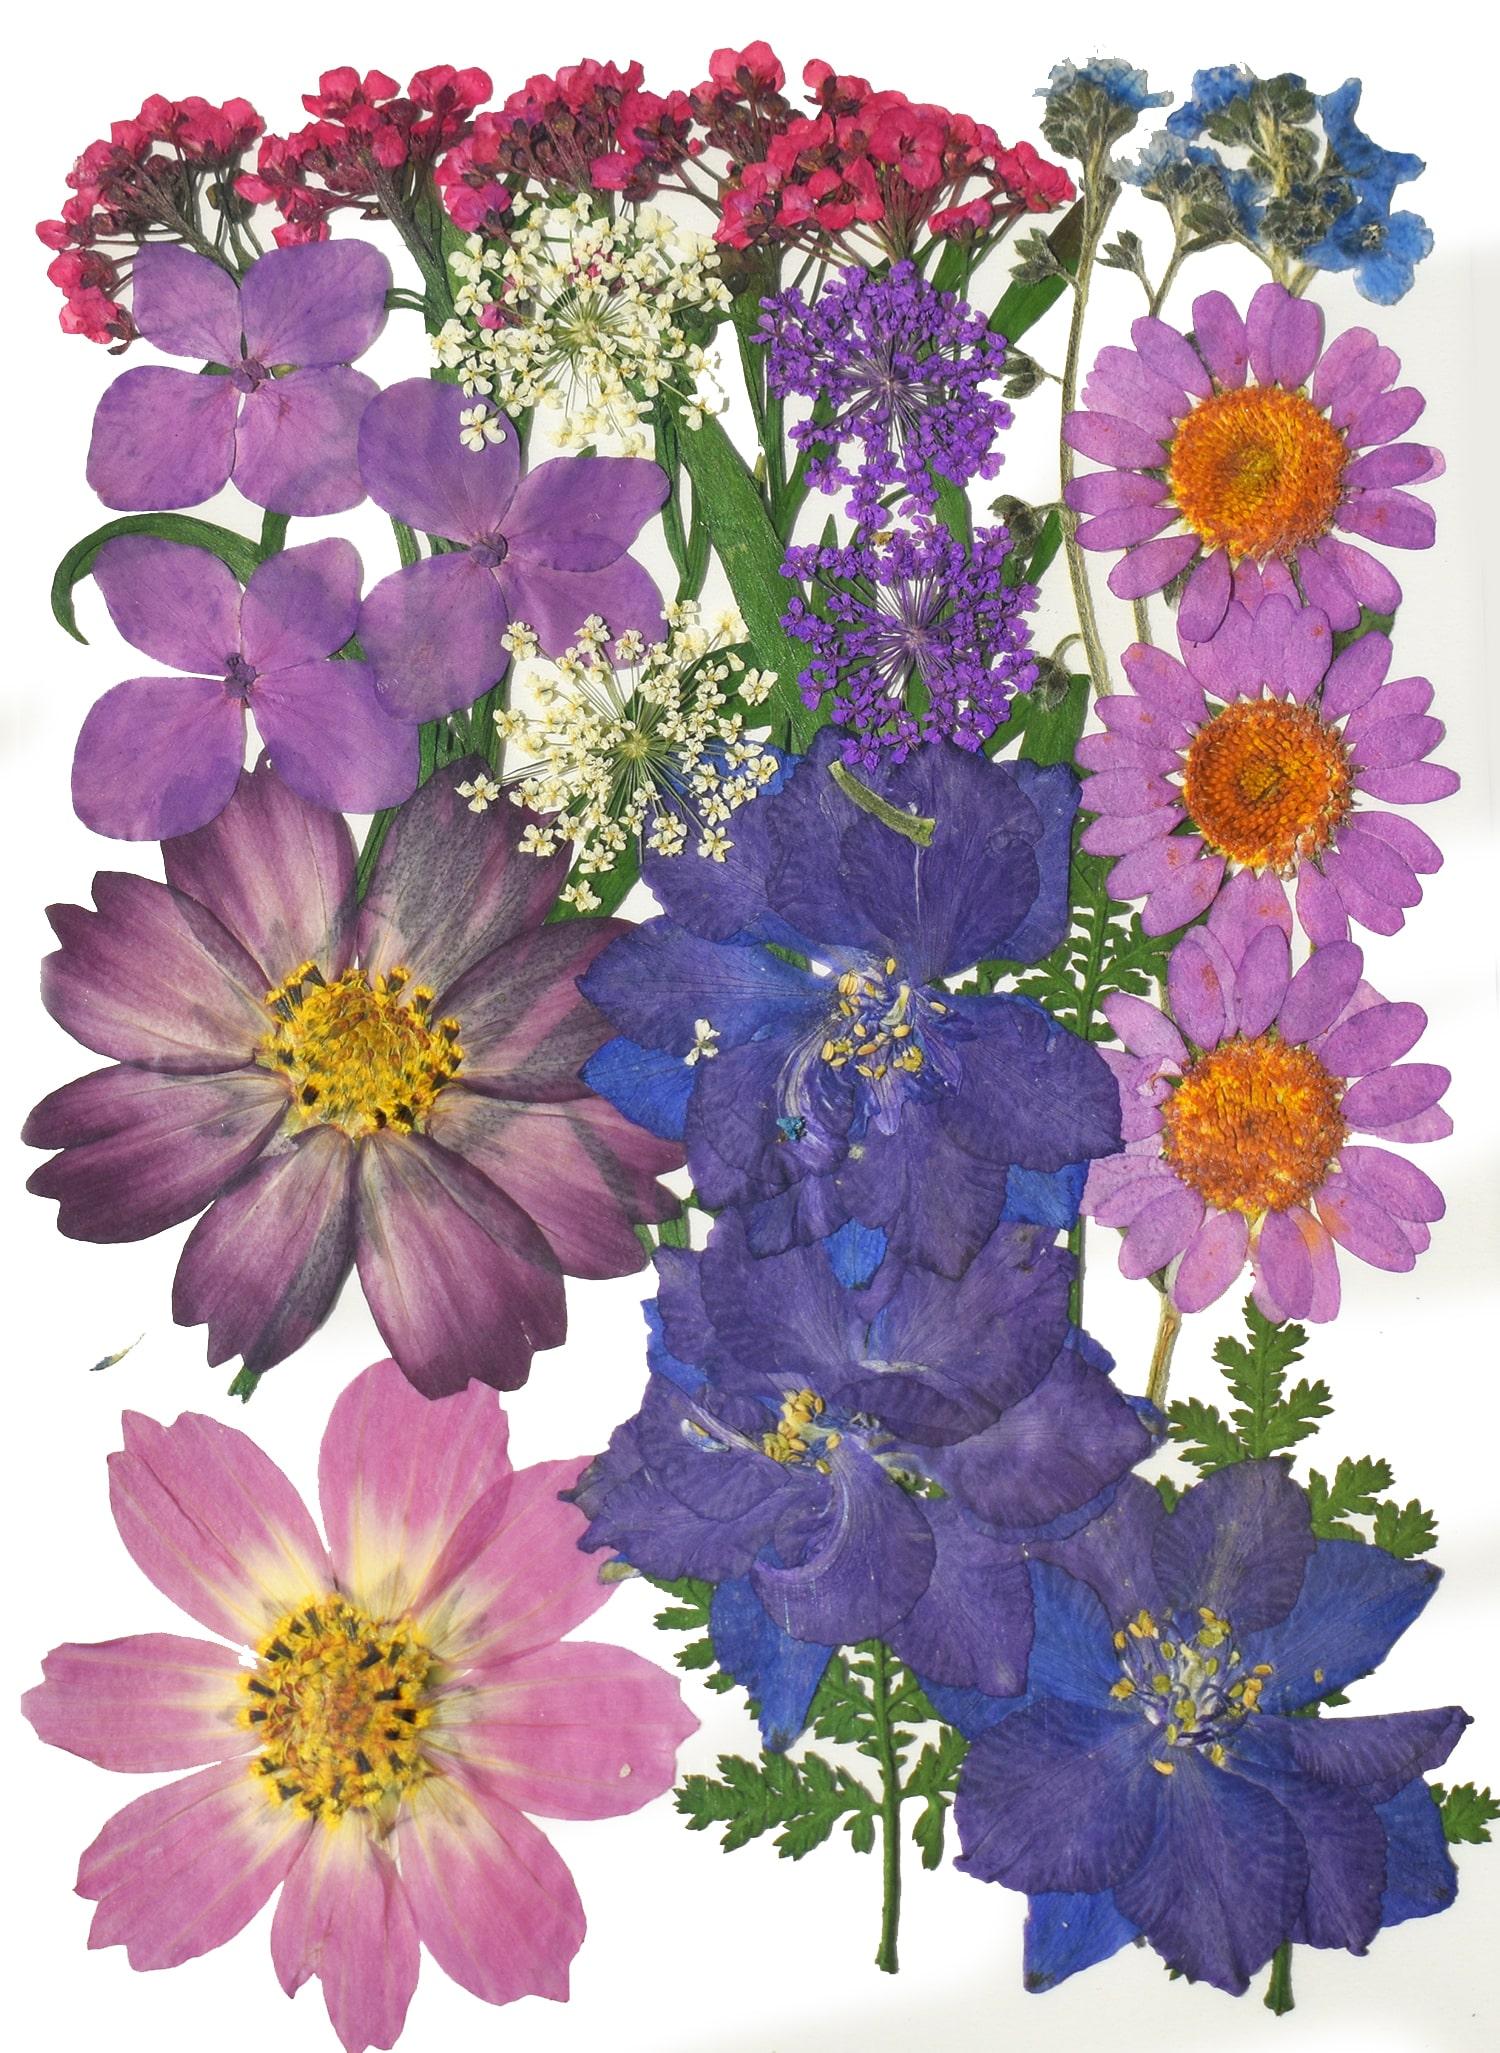 I Tipi Di Fiori.Bouquet Viola 9 Tipi Di Fiori Pressati Resine Epossidiche